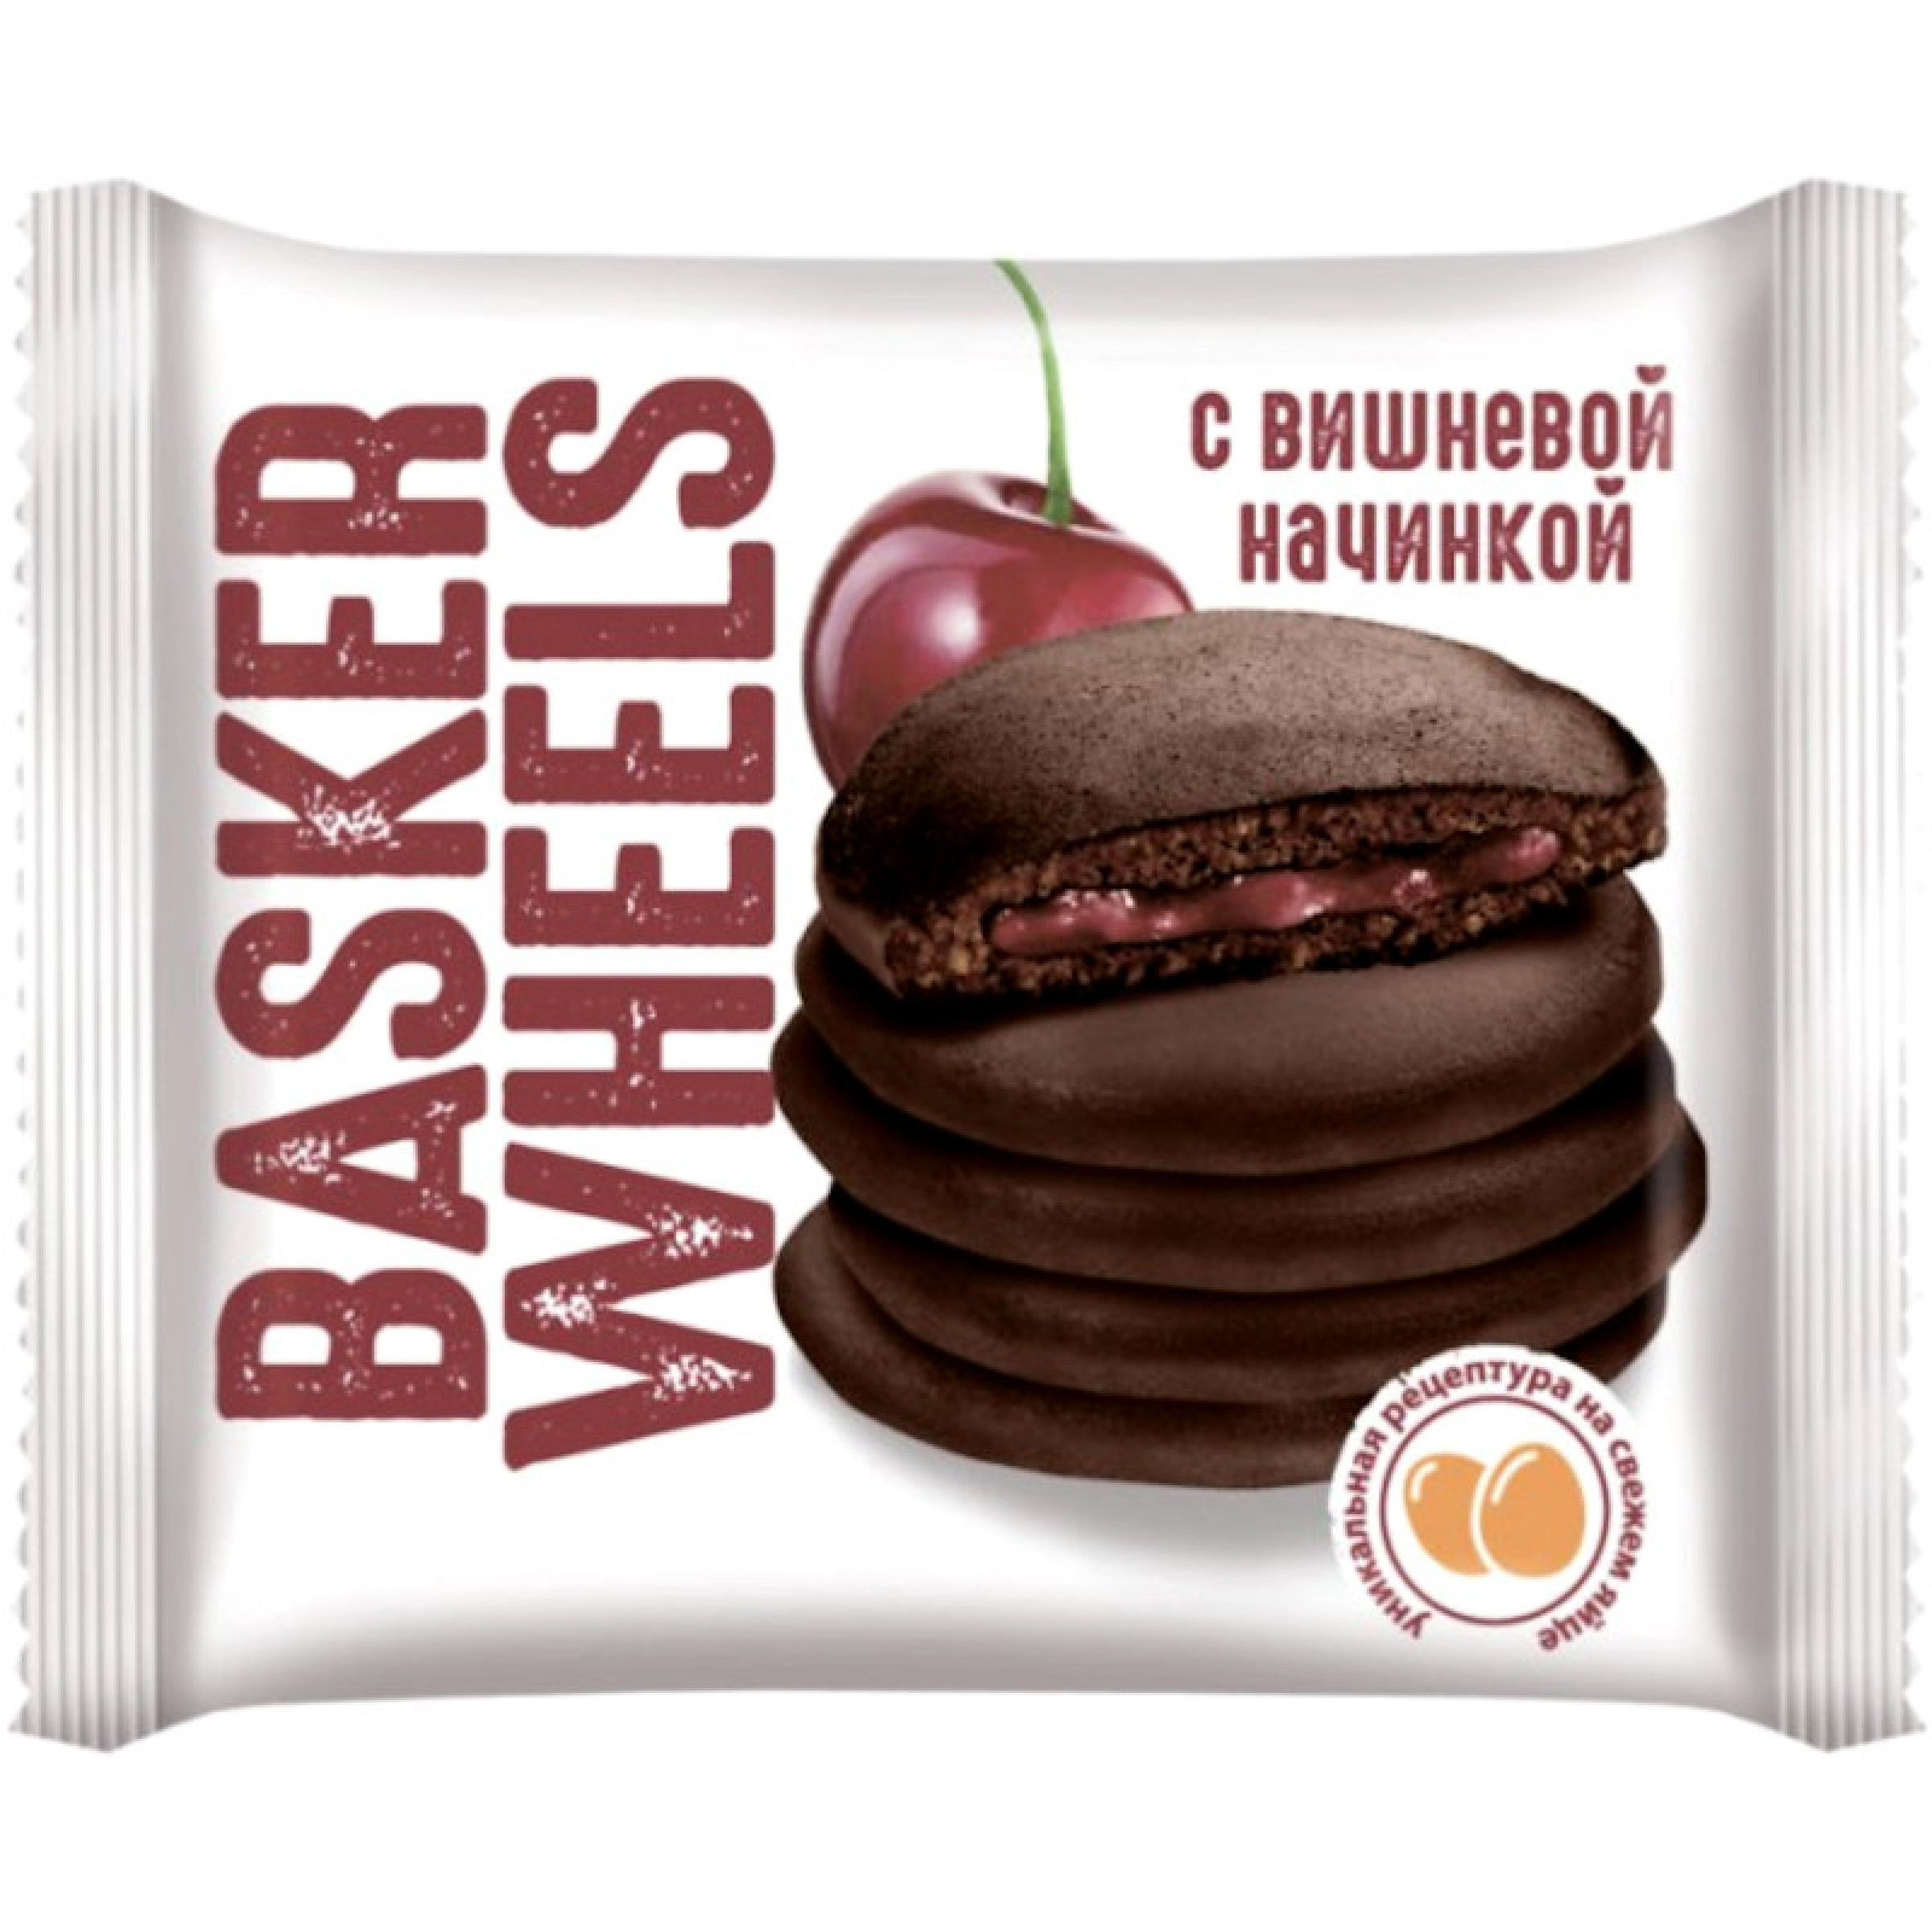 Панкейк BASKERWEELS какао с вишней, 36 гр